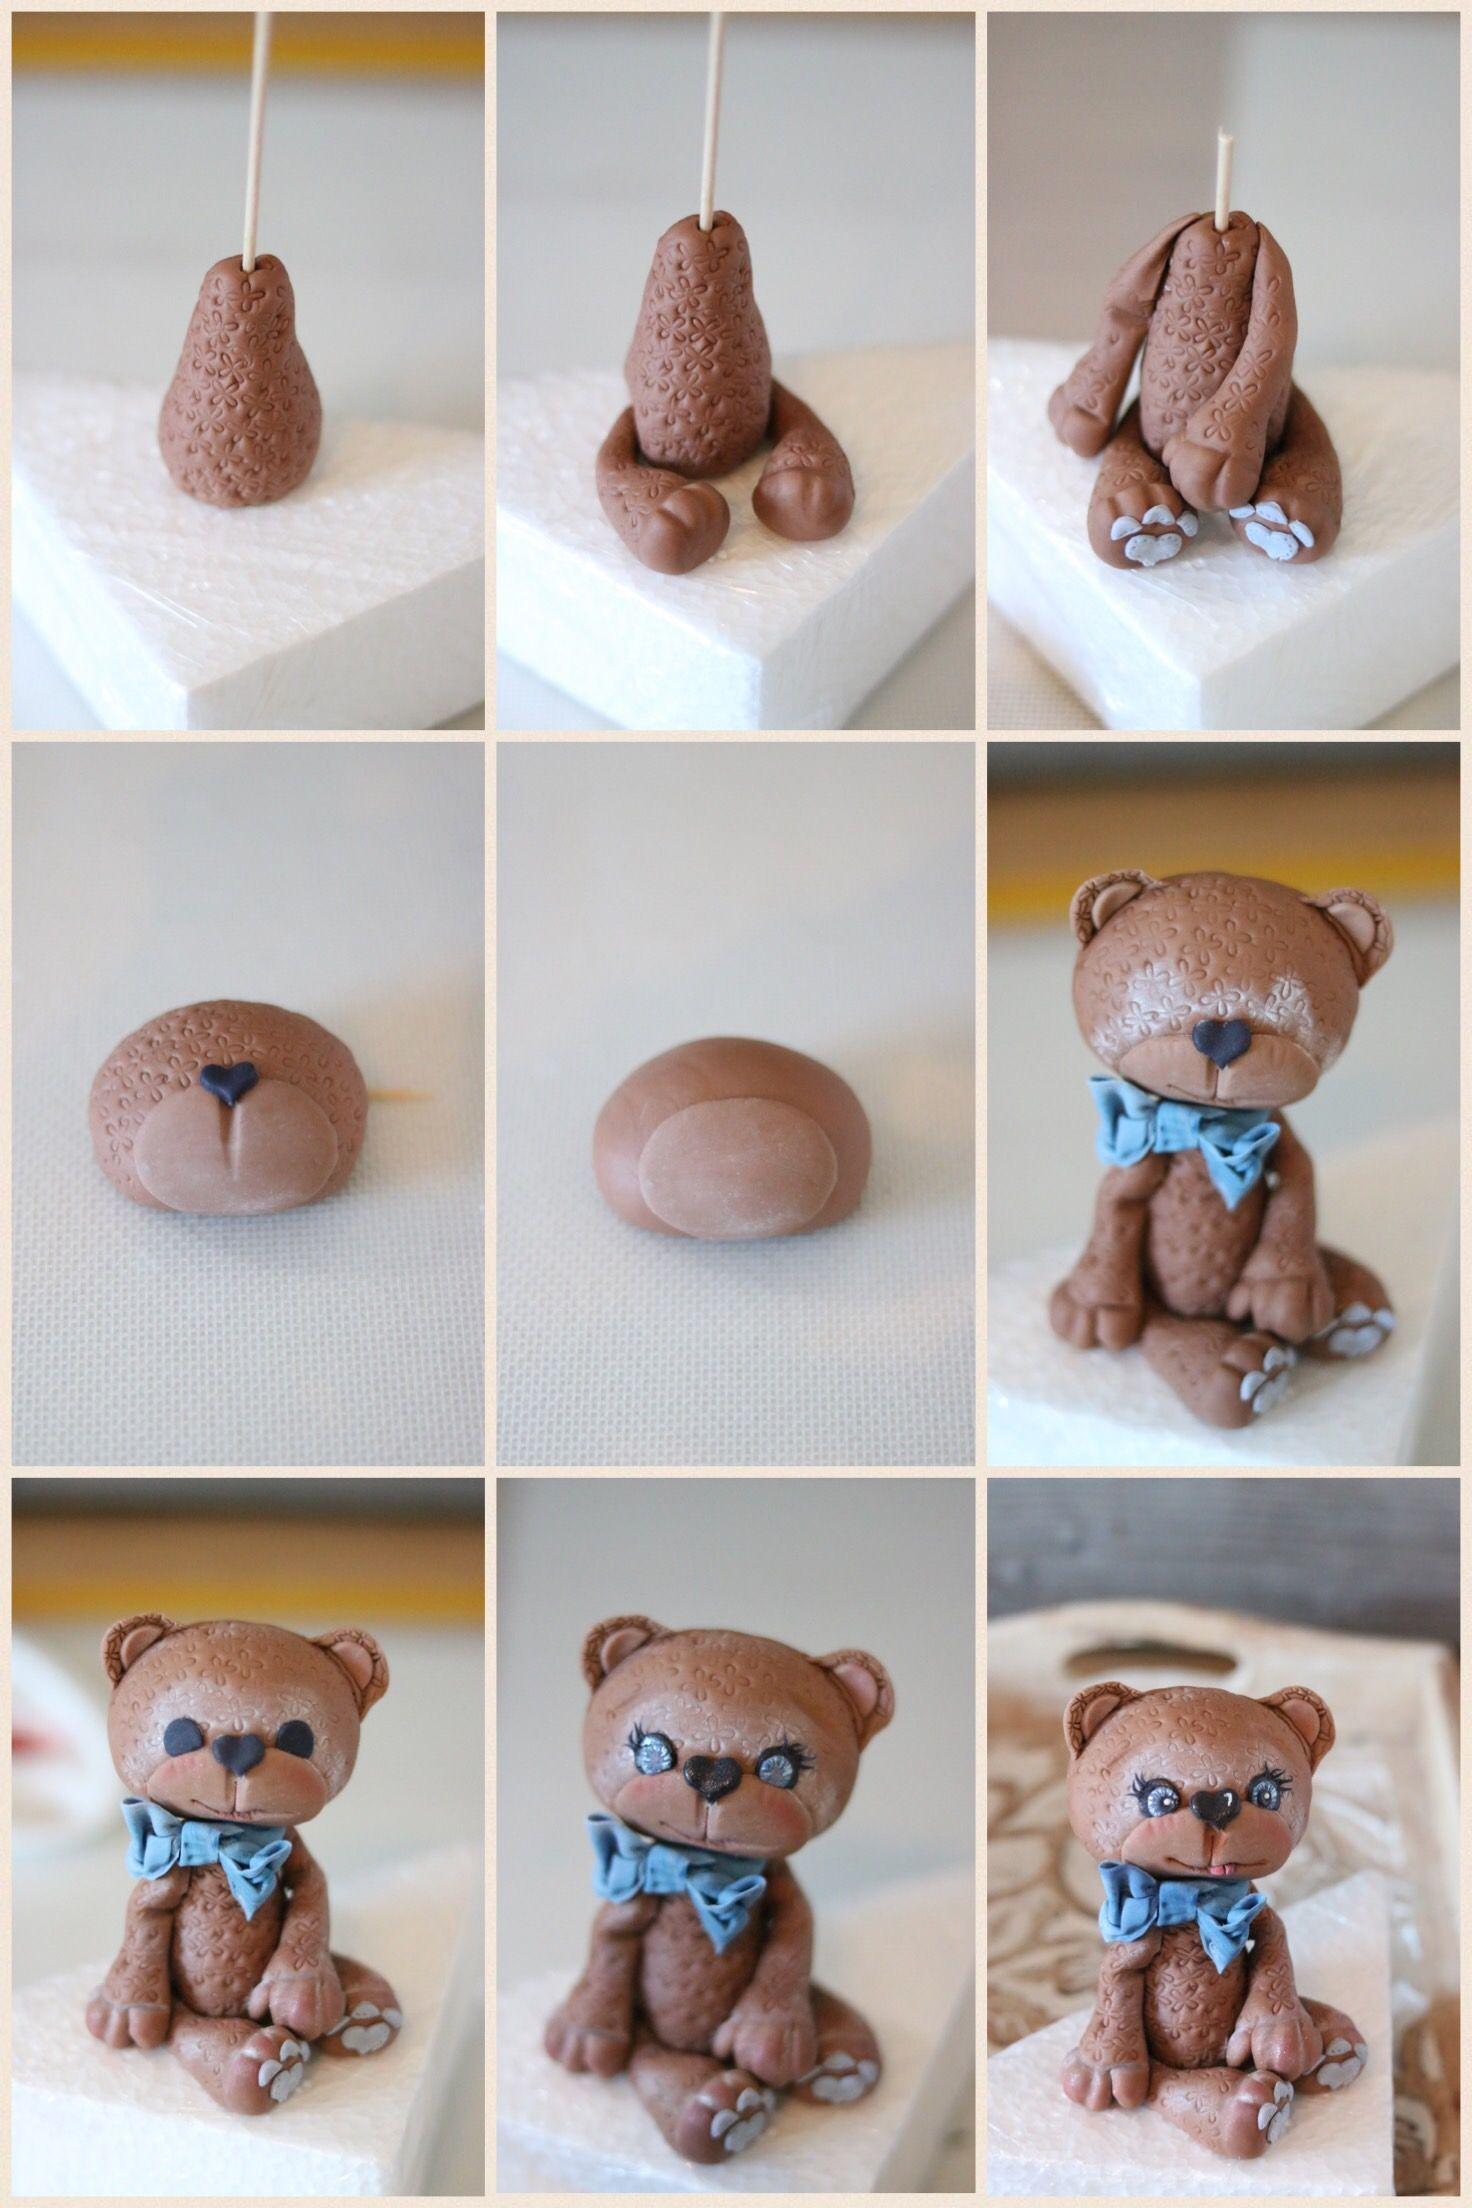 Anleitung für Teddybär aus Fondant Monika Triebenbacher